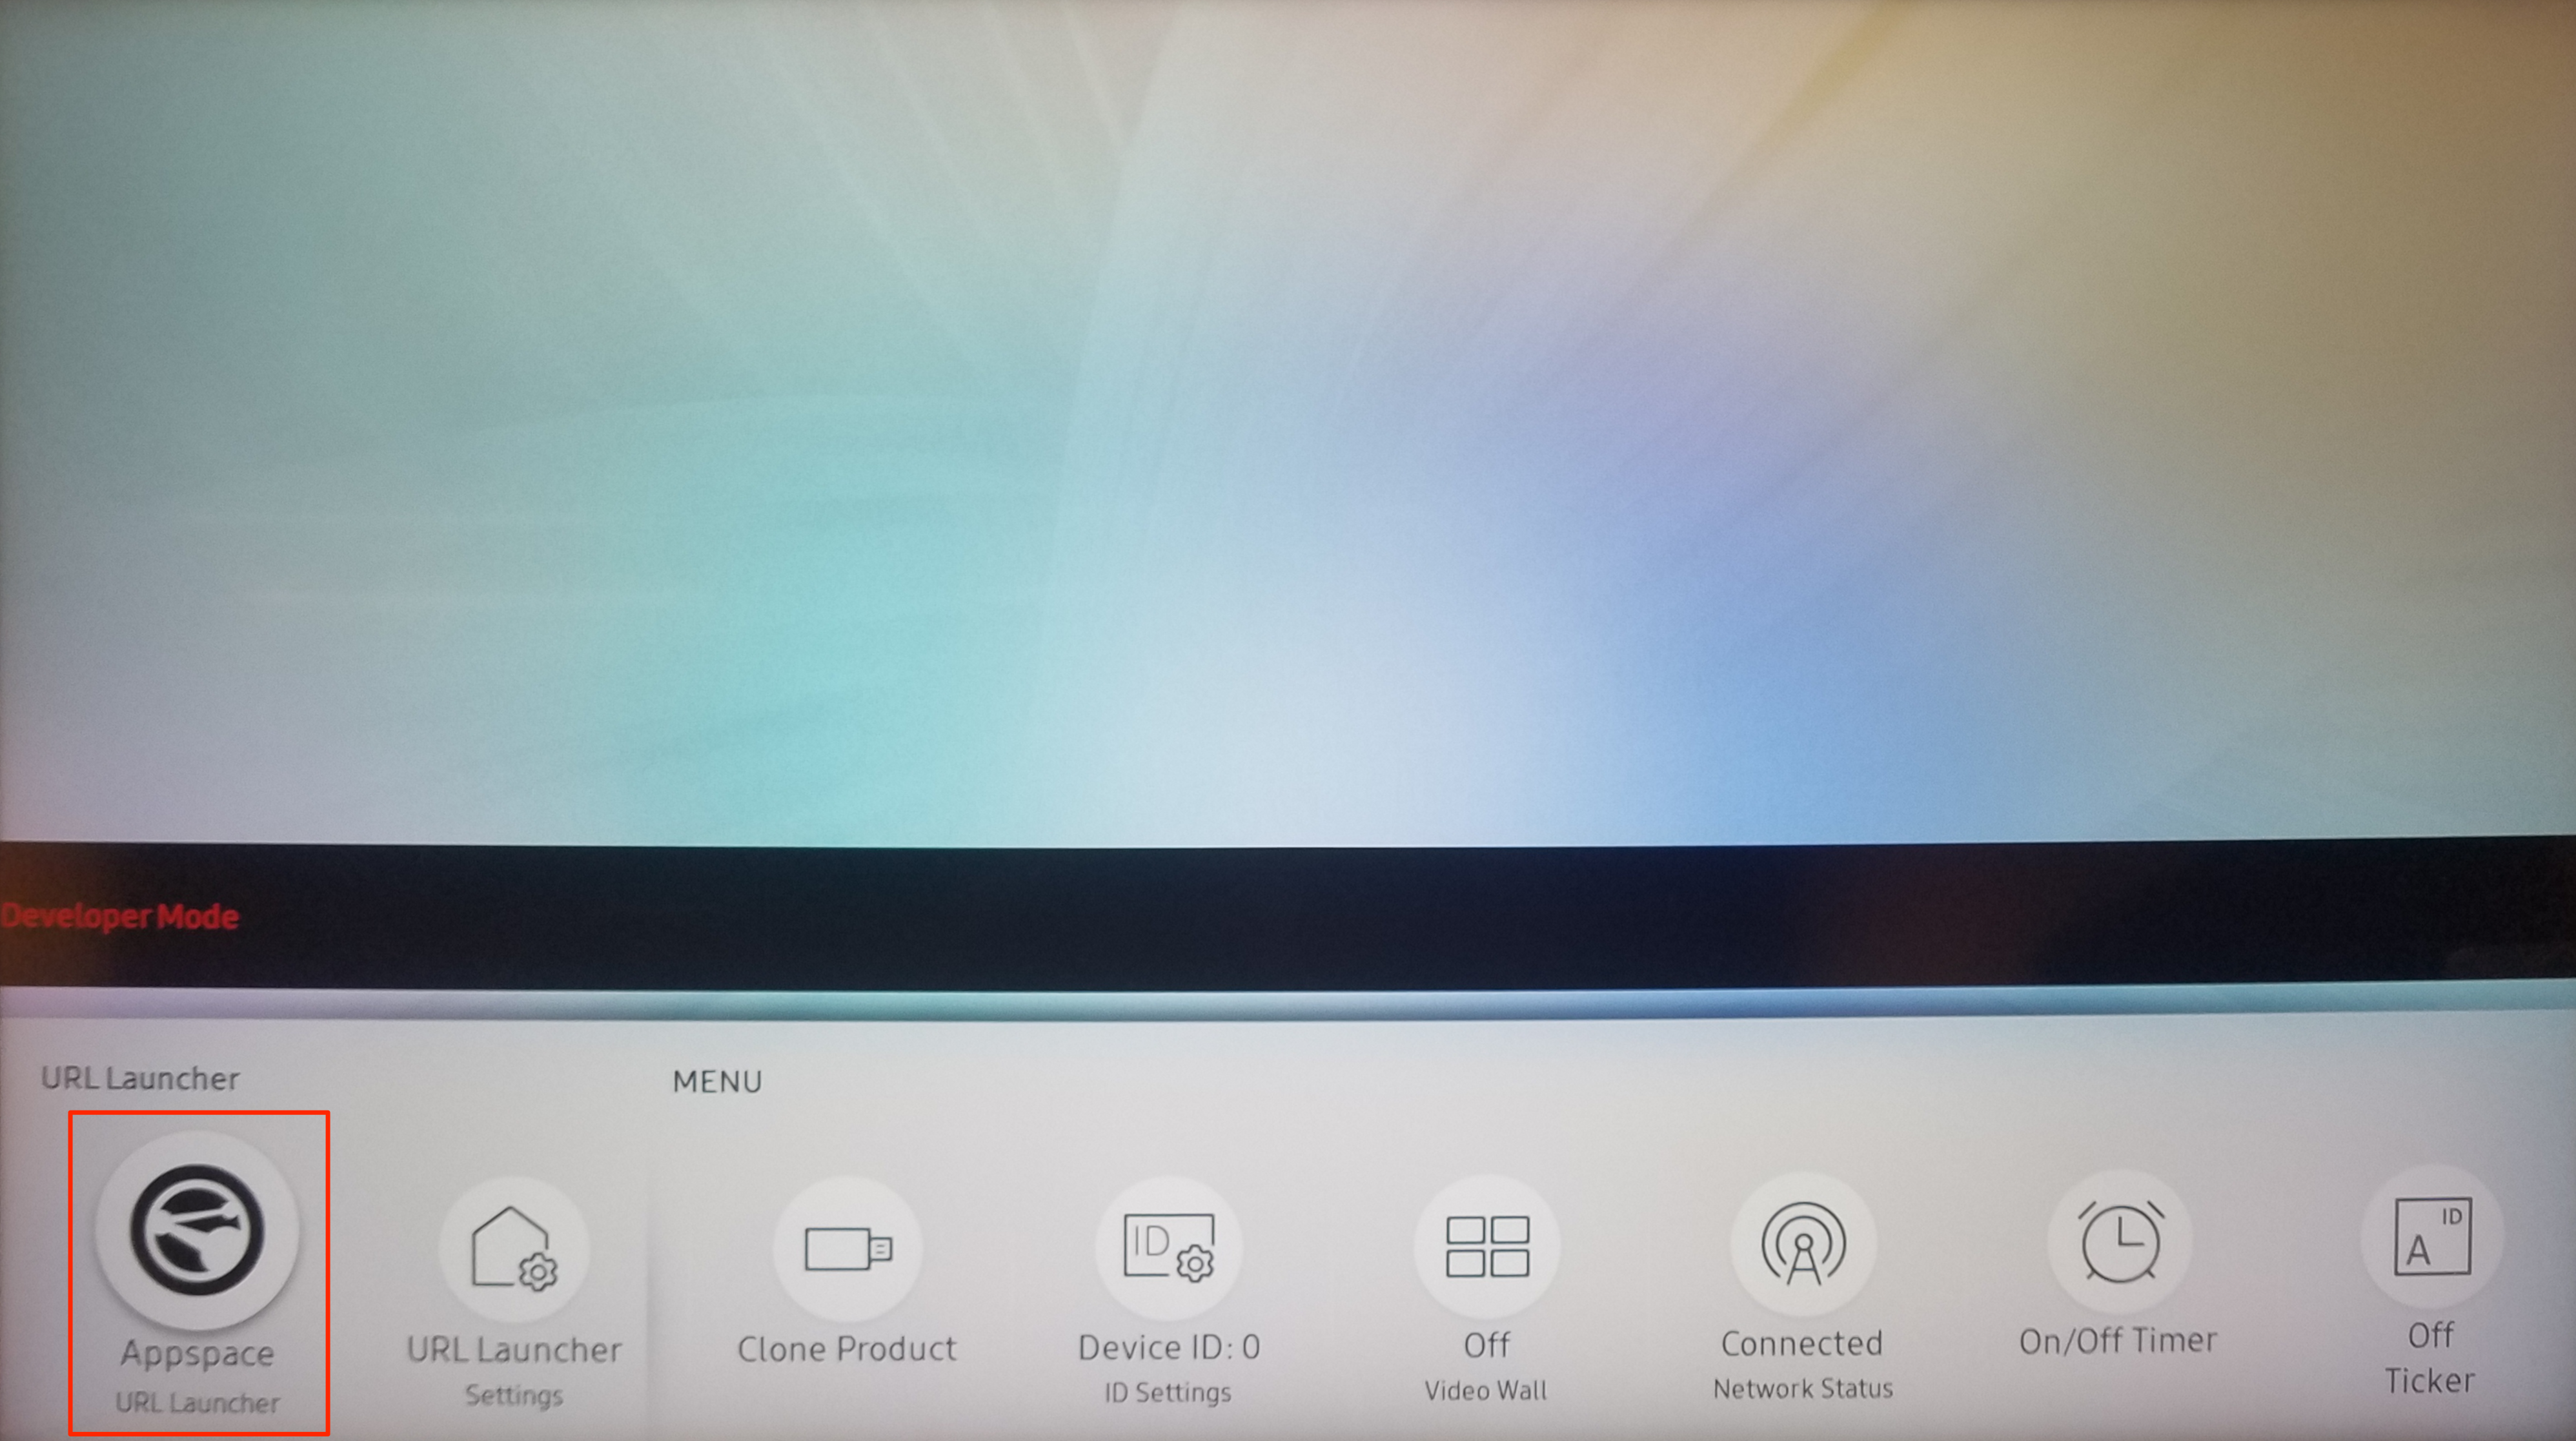 Install Appspace App on Universal Windows Platform